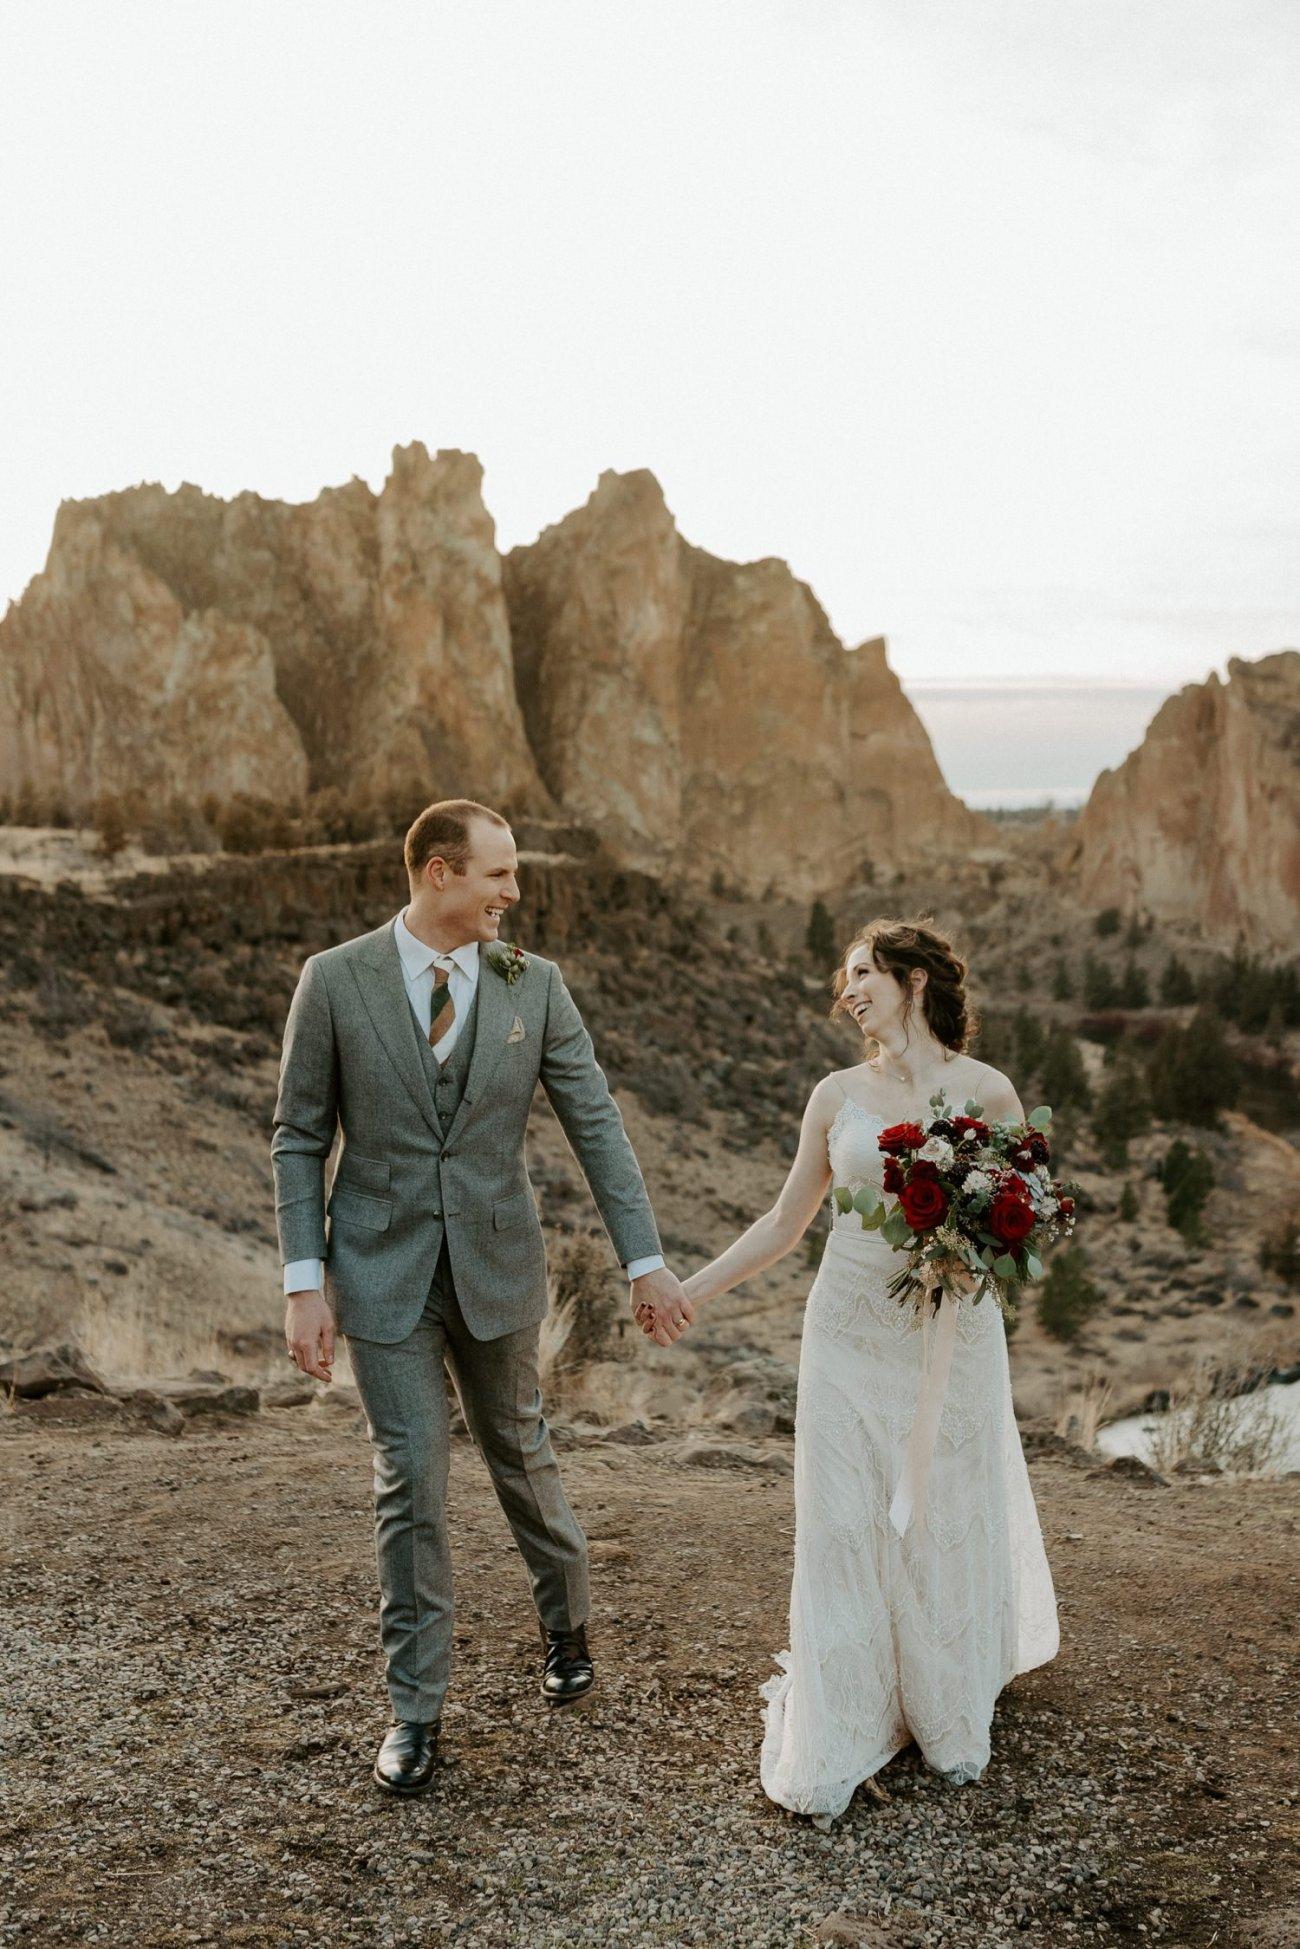 Smith Rock State Park Elopement Bend Oregon Elopement Photographer Anais Possamai Photography 030